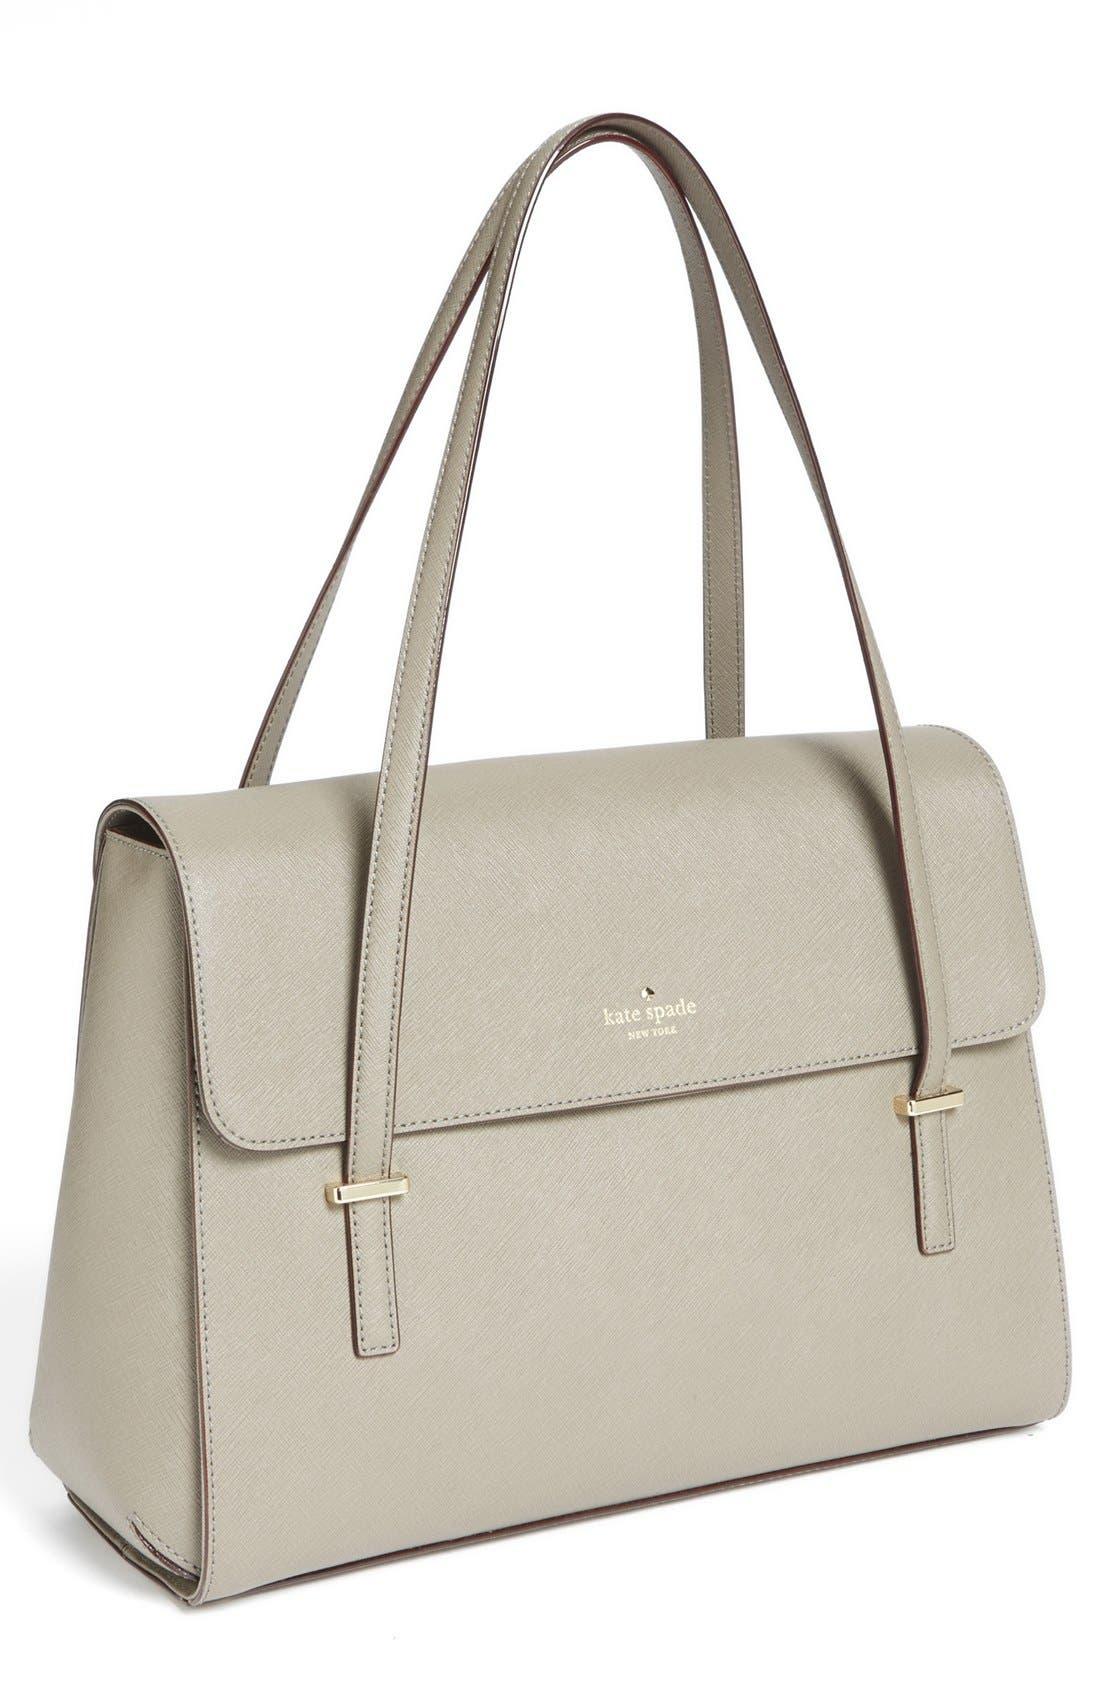 Main Image - kate spade new york 'cedar street - luciana' shoulder bag, large